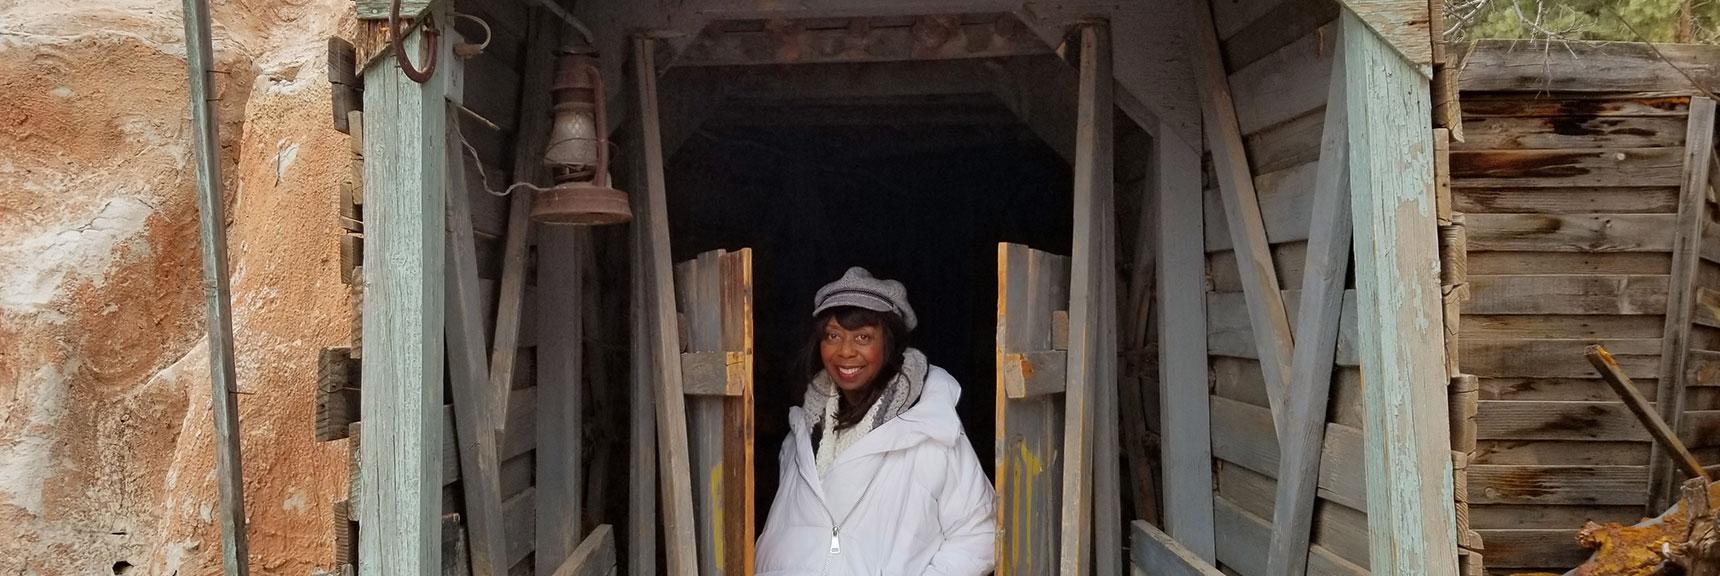 Mine Entrance at Bonnie Springs Ranch, Nevada